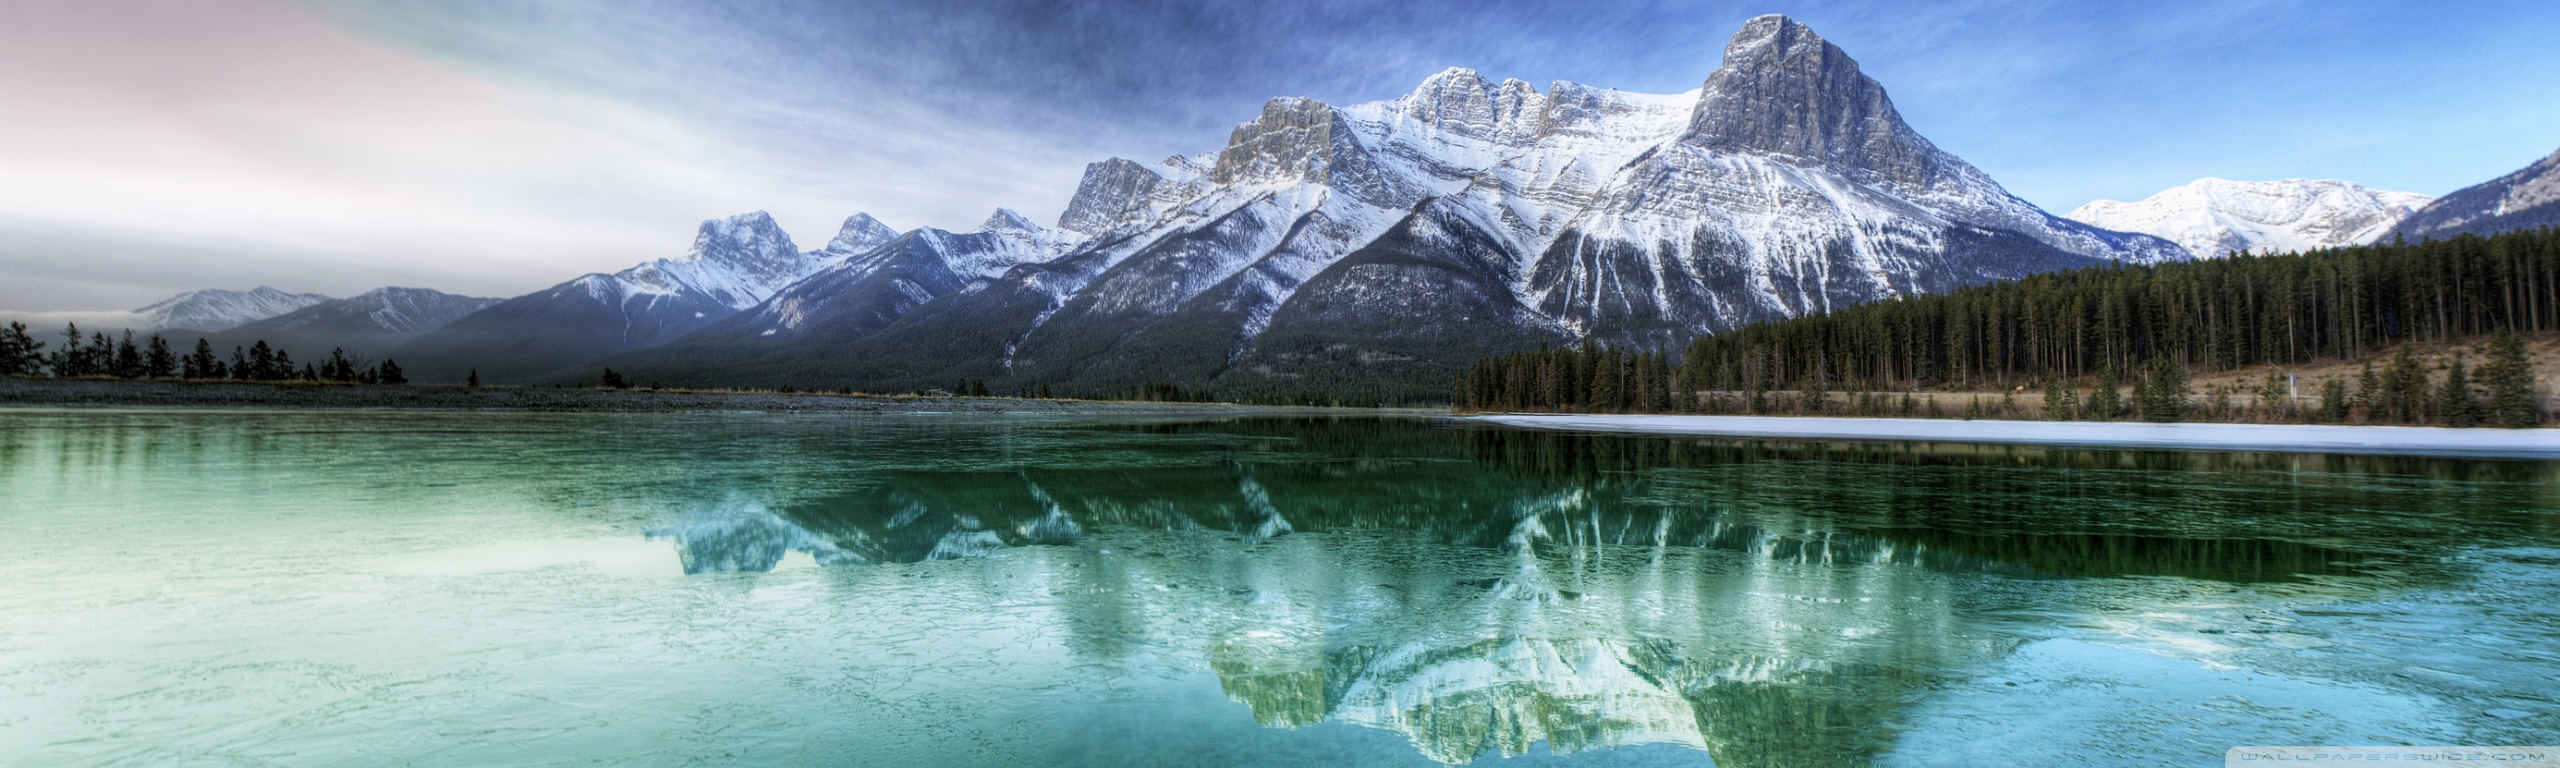 Fall Dual Monitor Wallpaper Mountain Lake Scenery 4k Hd Desktop Wallpaper For 4k Ultra